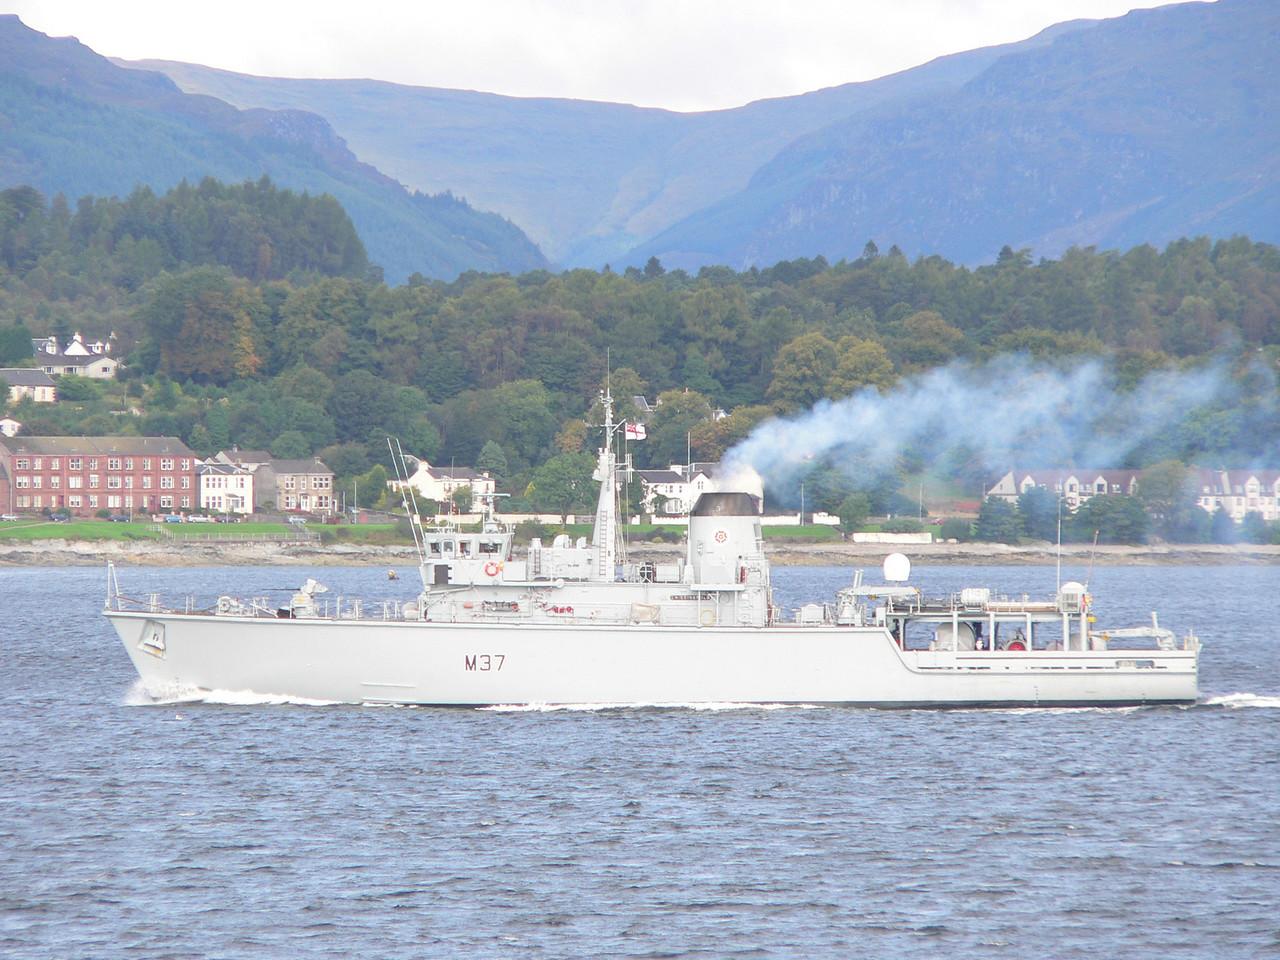 M-37 HMS CHIDDINGFOLD